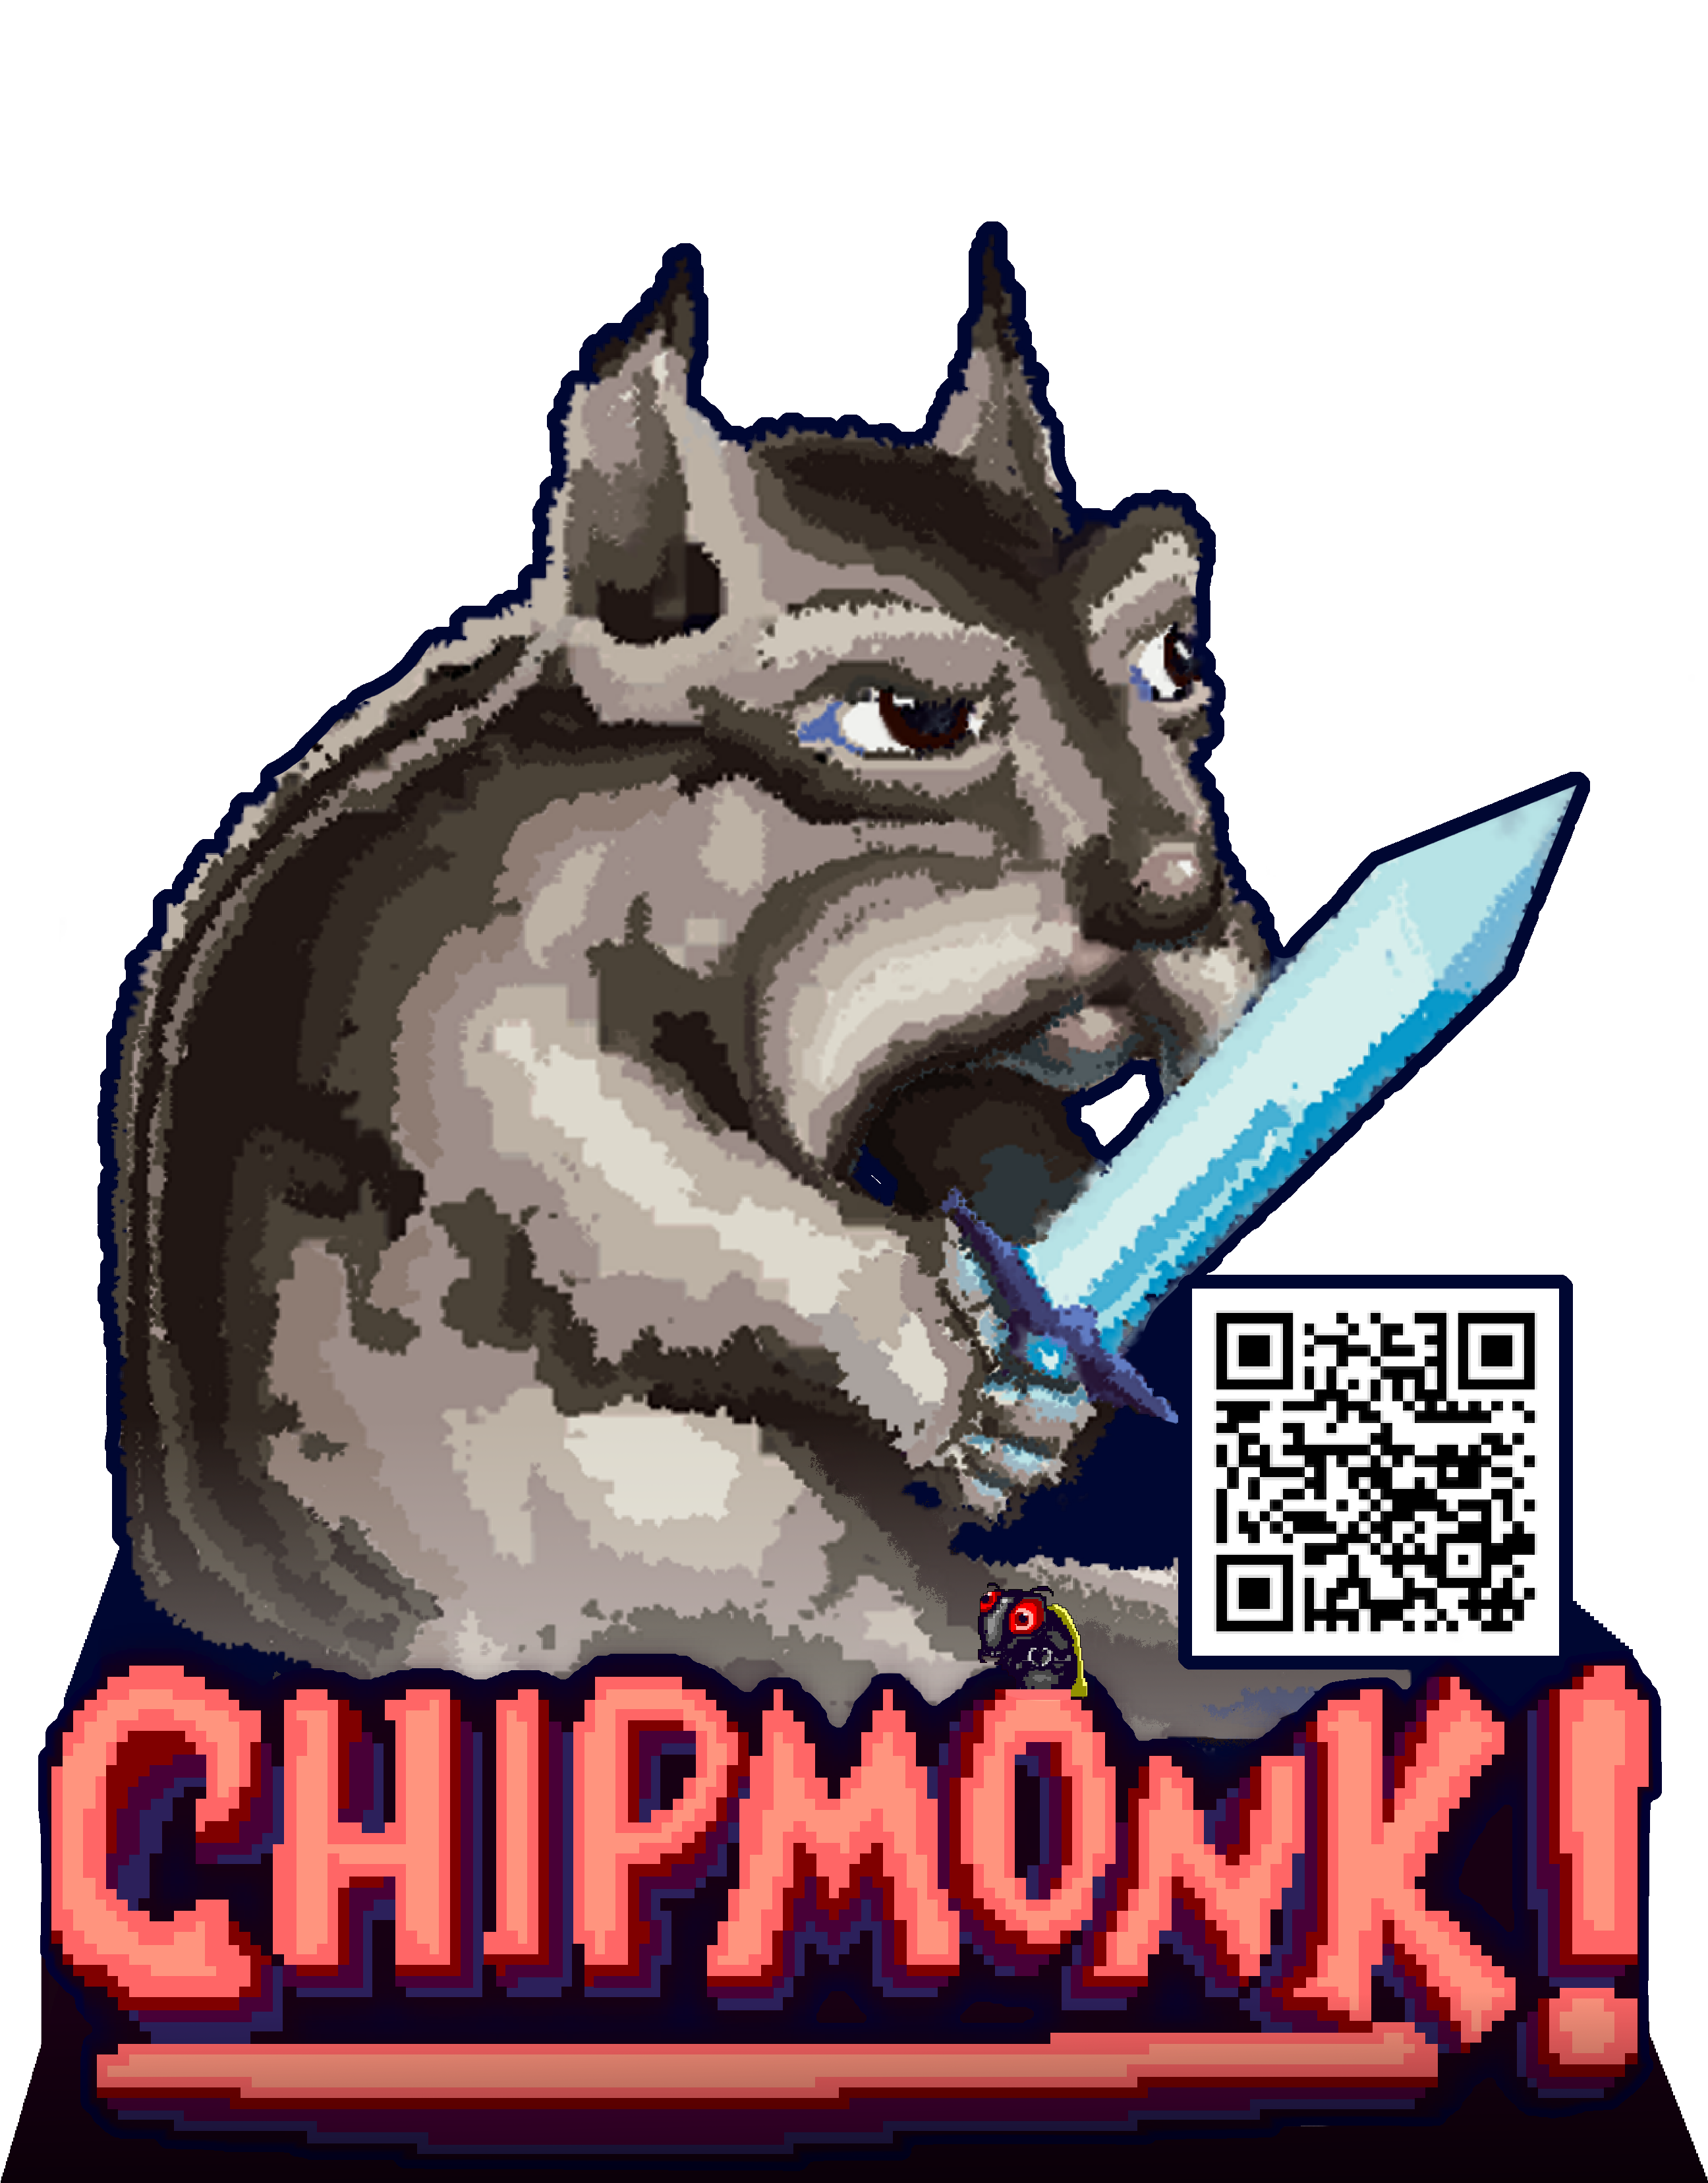 Chipmonk_Gray_Cardboard_Graphic.png